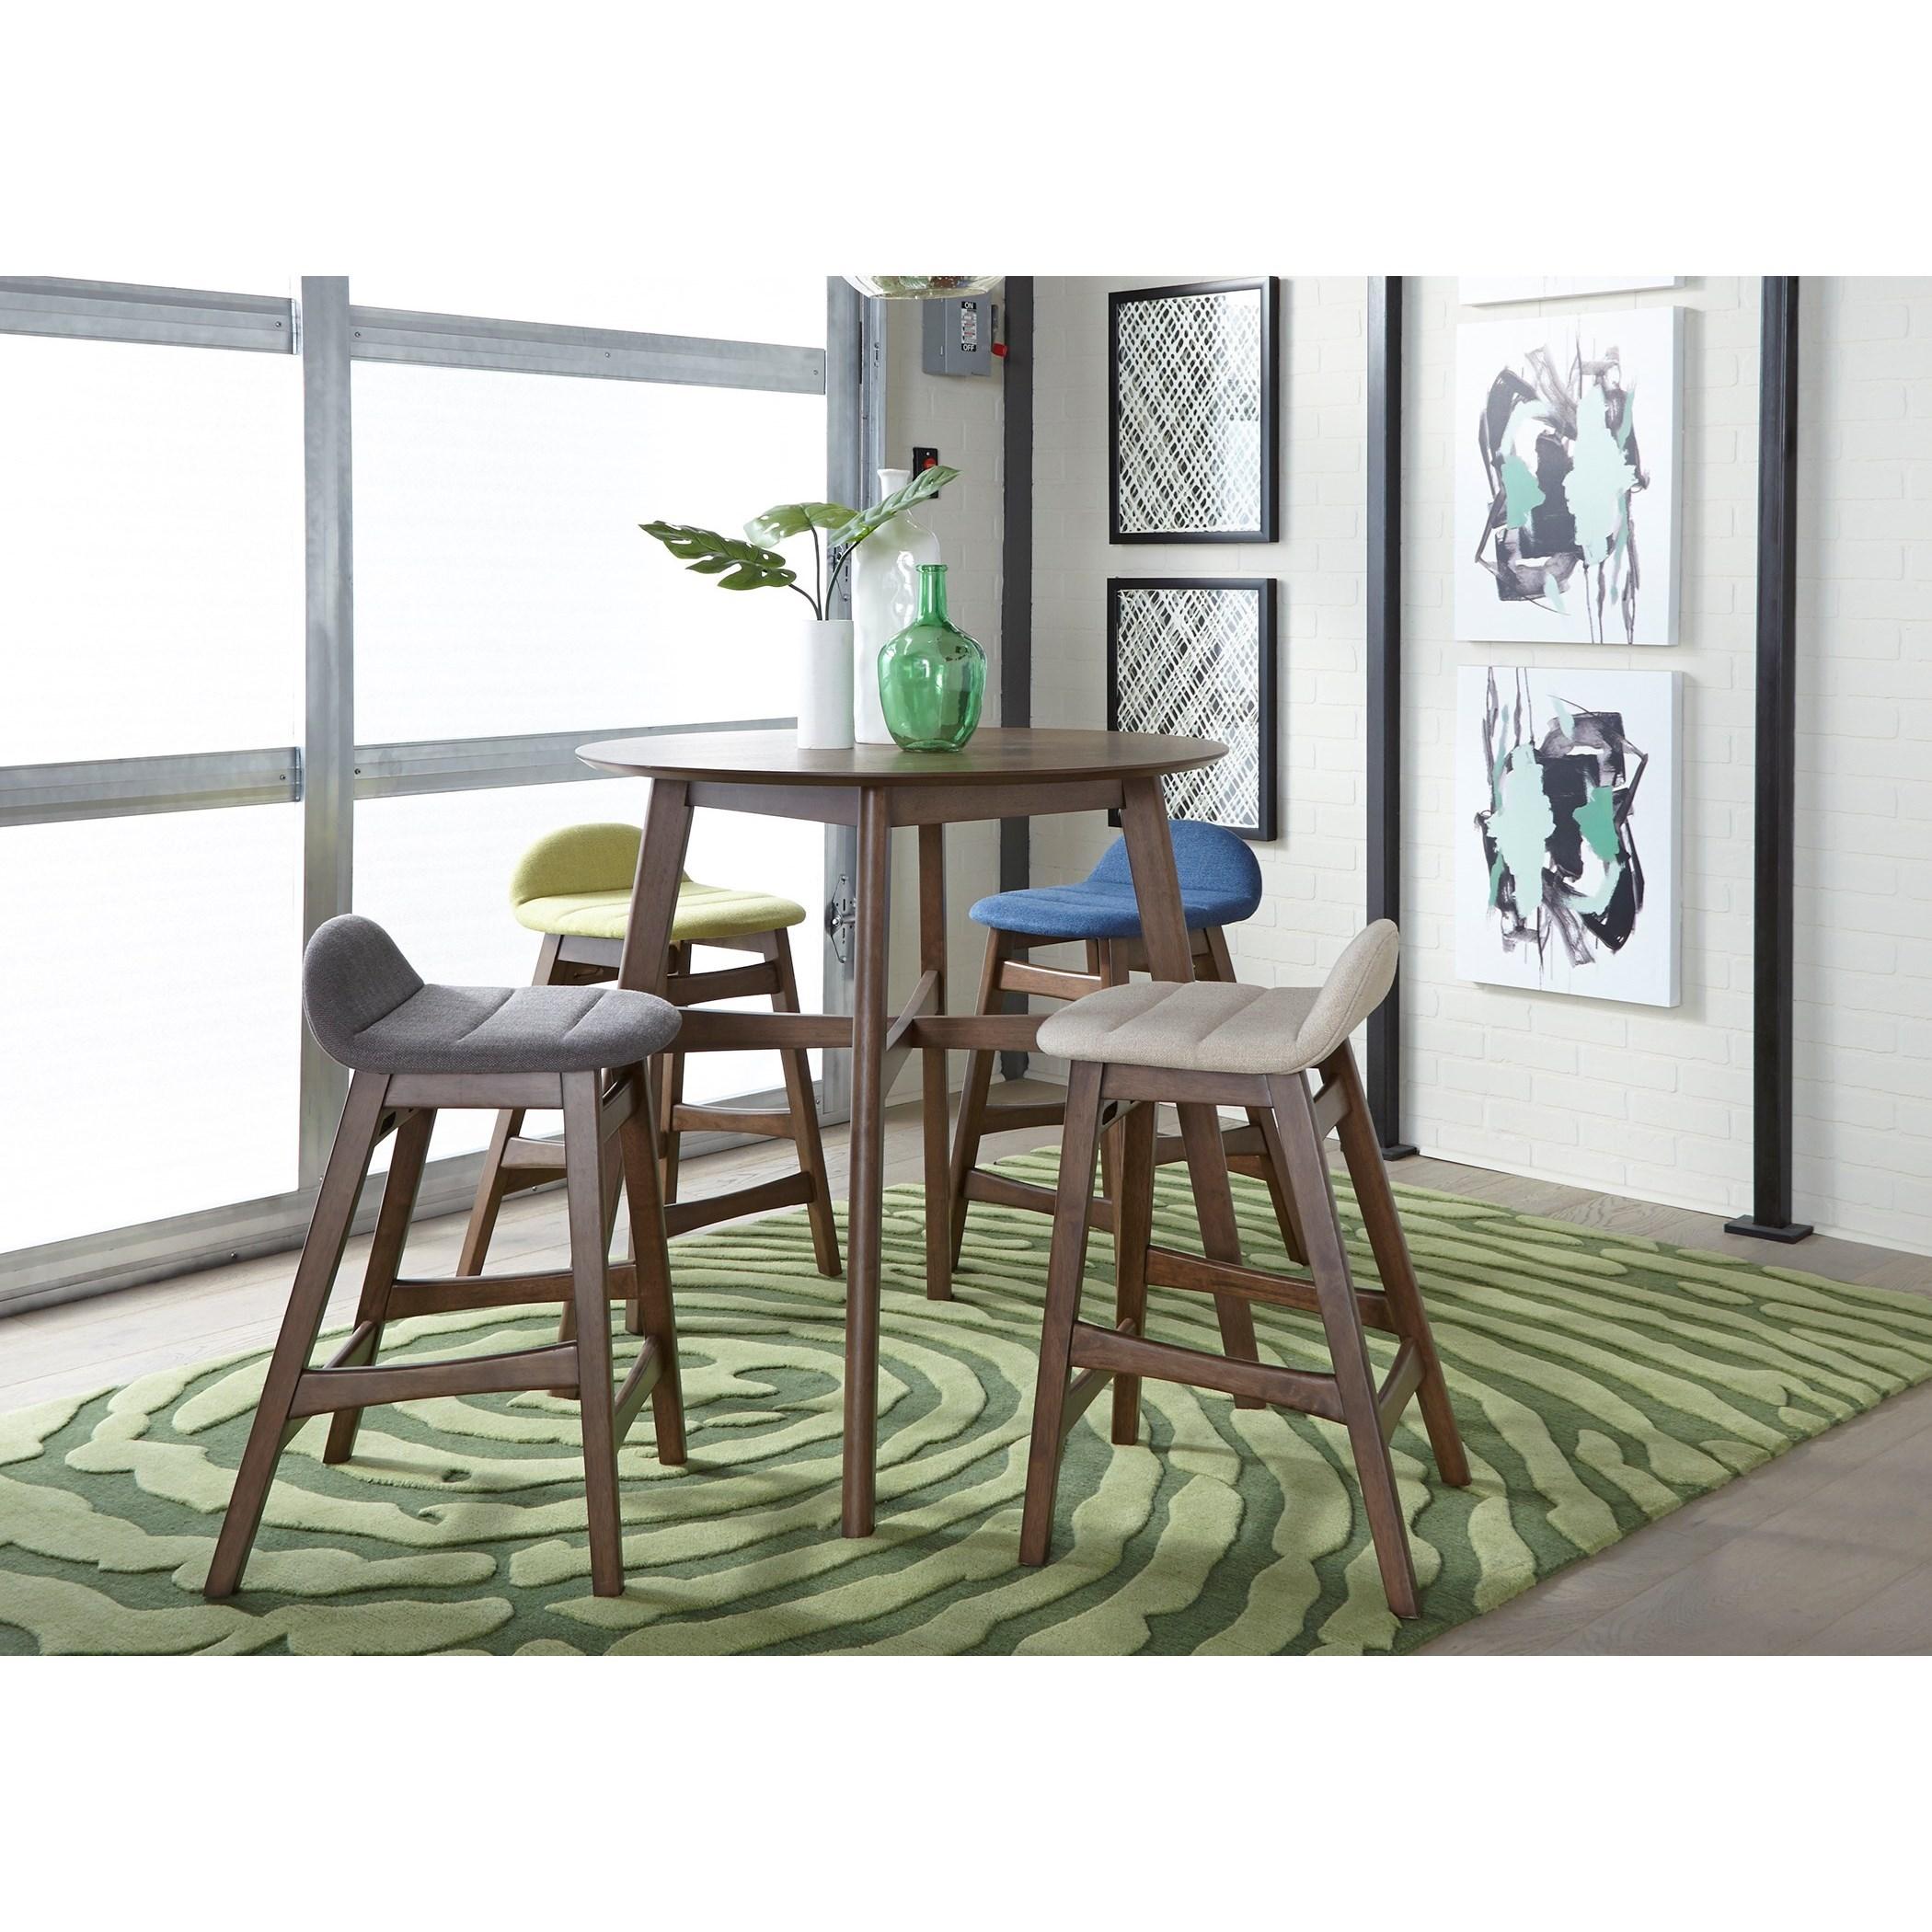 5-Piece Gathering Table Set